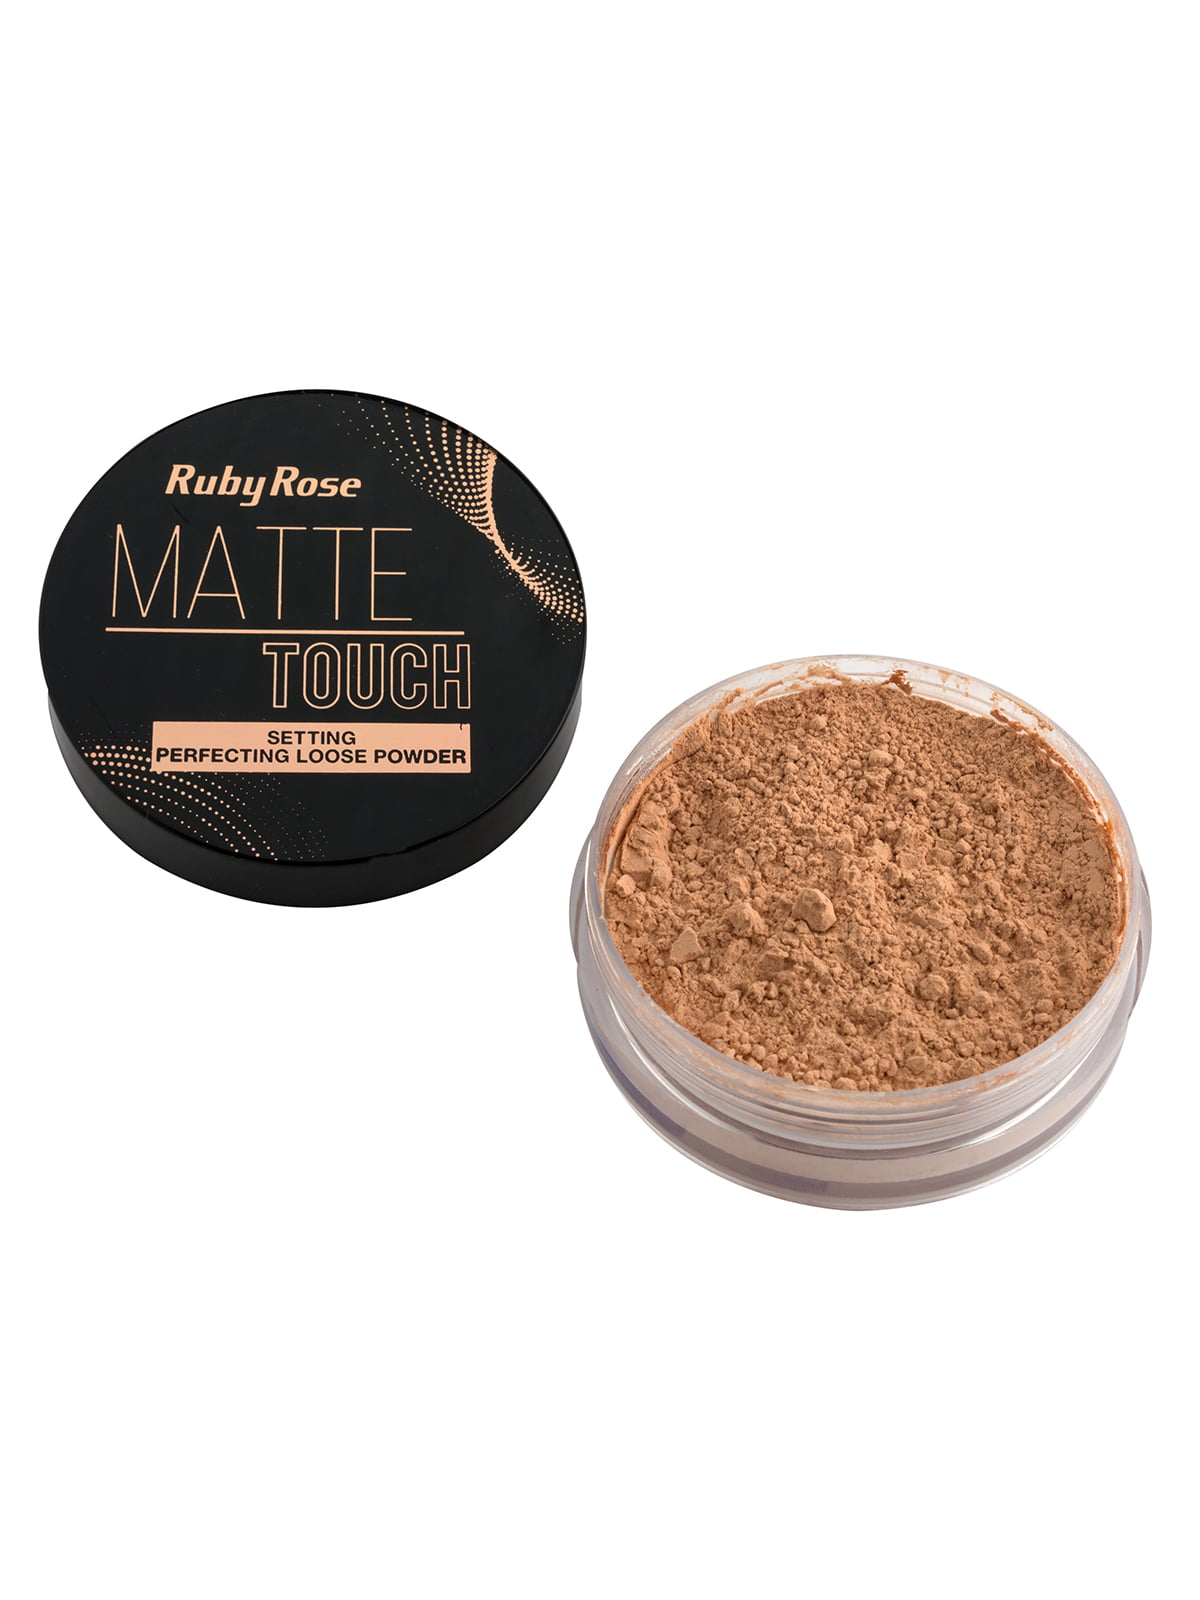 Пудра розсипчата Matte Touch Setting Perfectiing Loose Powder (8,5 г) | 5223495